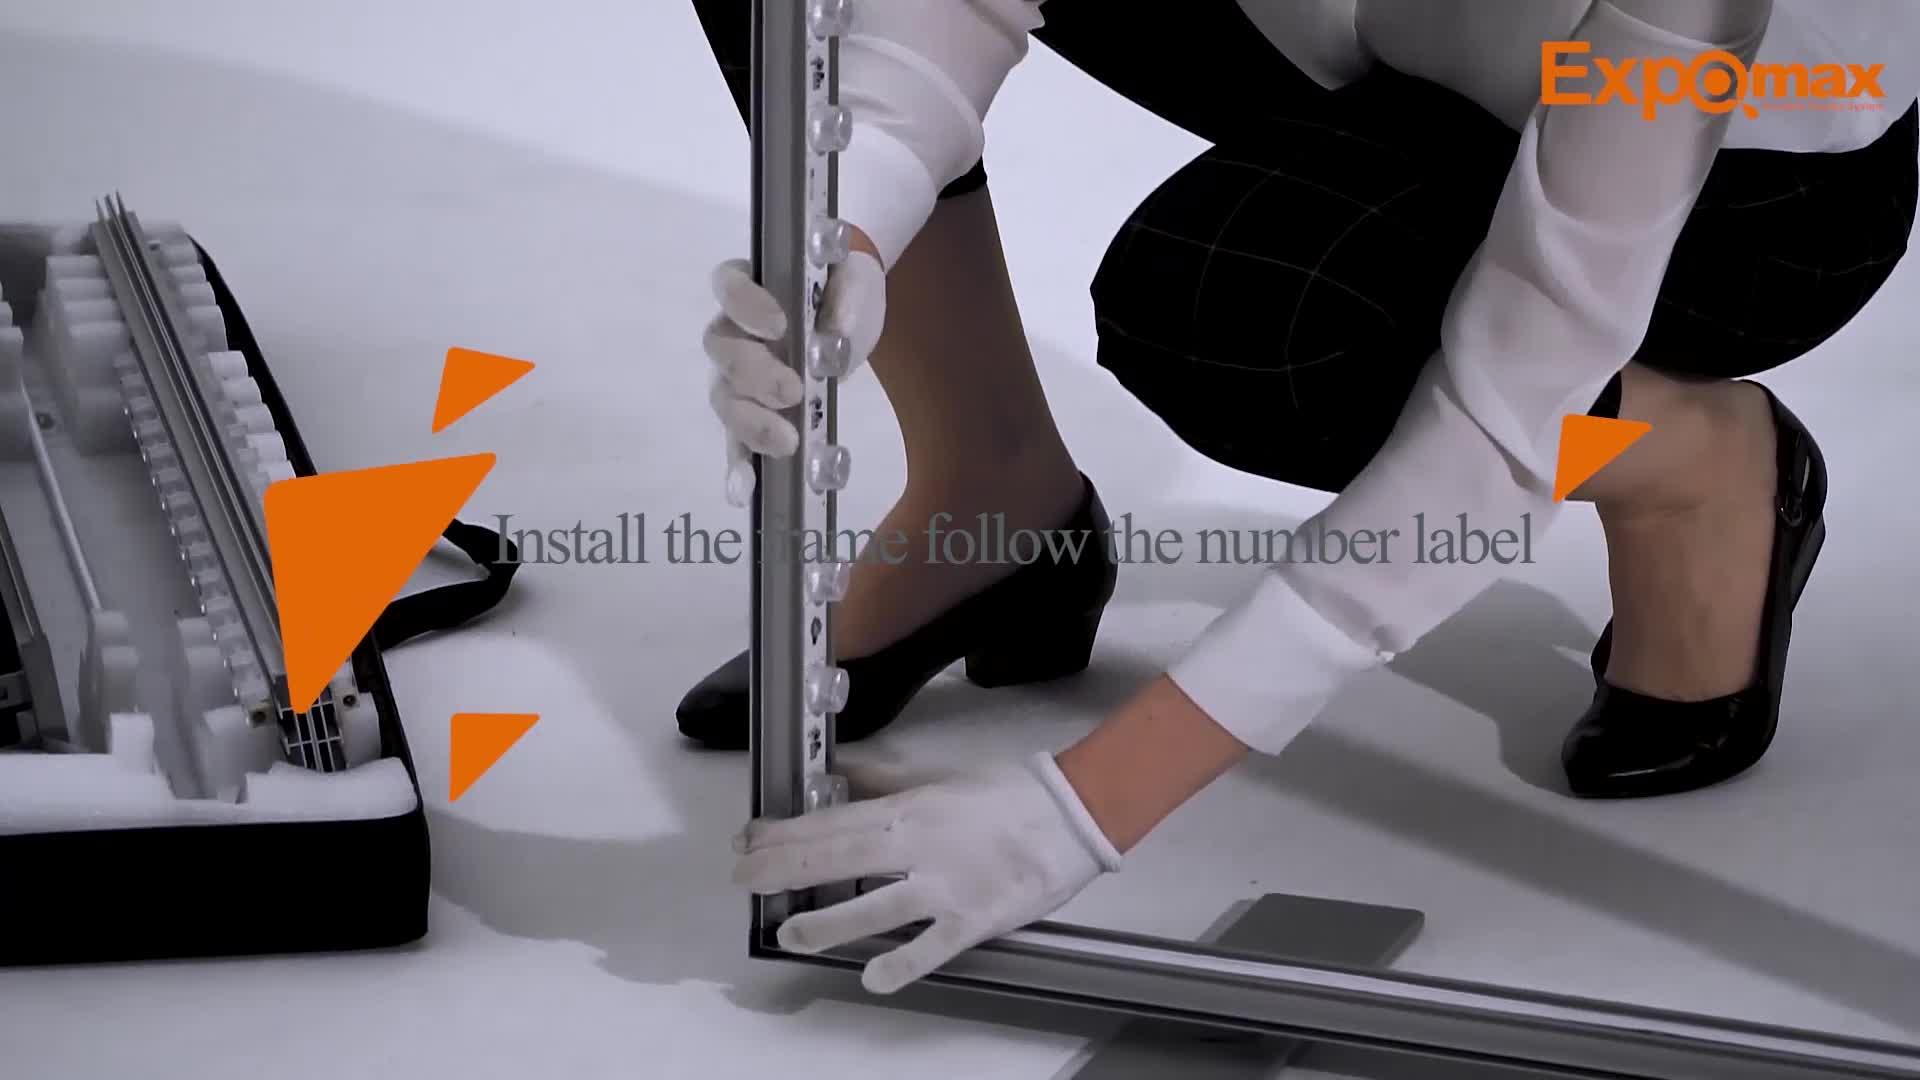 Easy set up free tool custom printing 80mm SEG Lightbox for exhibition booth